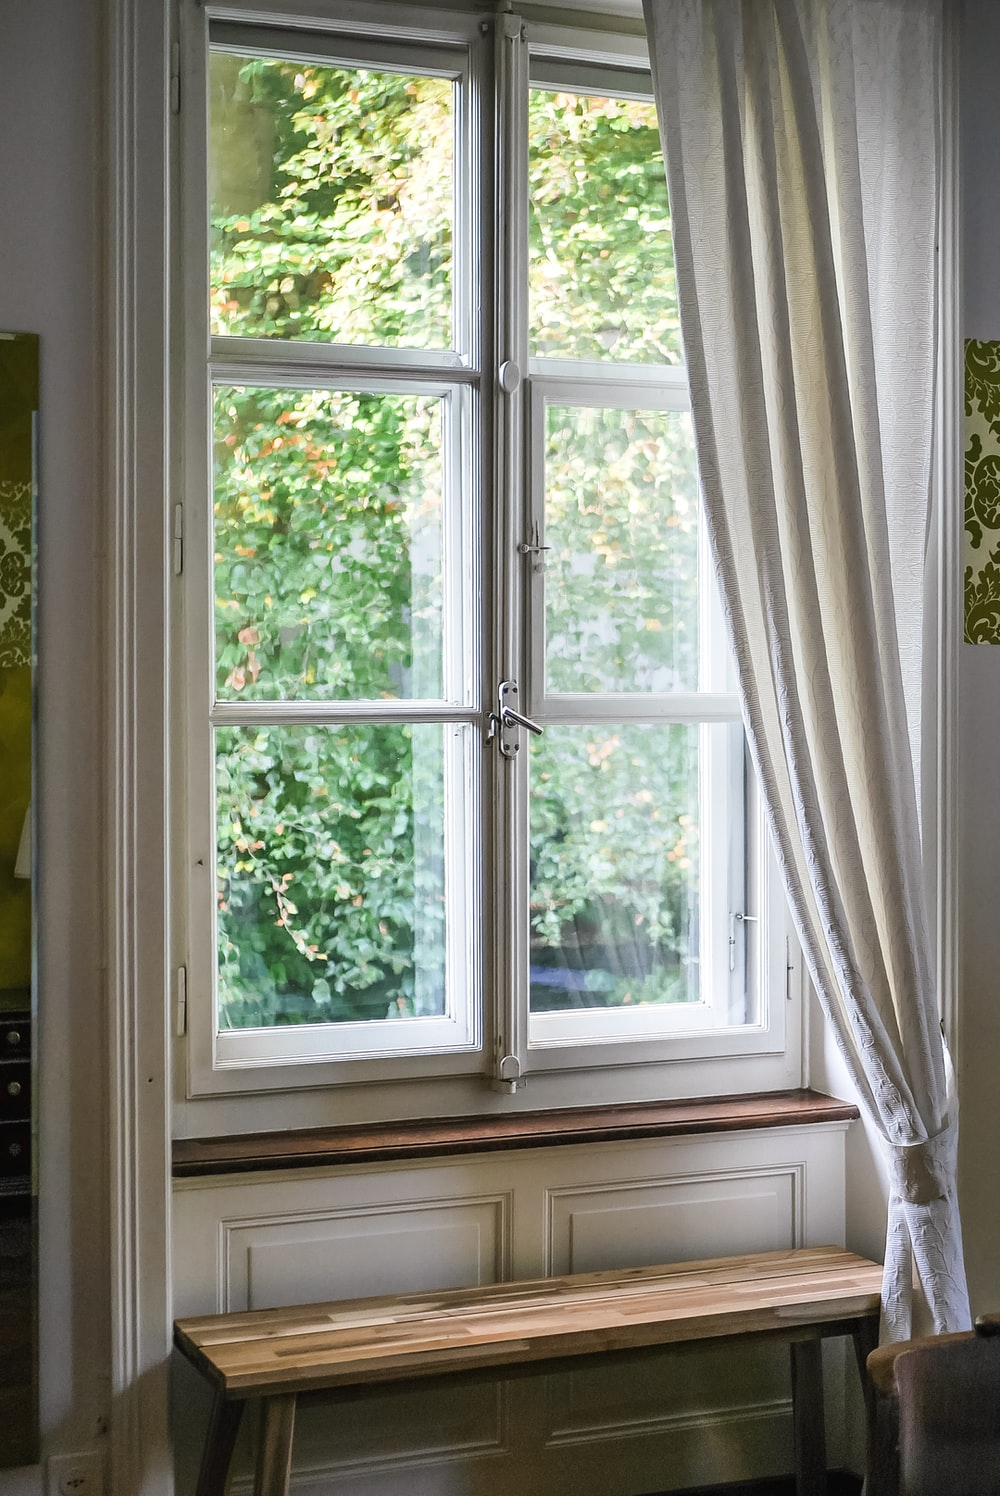 closed window photo – Free Window Image on Unsplash